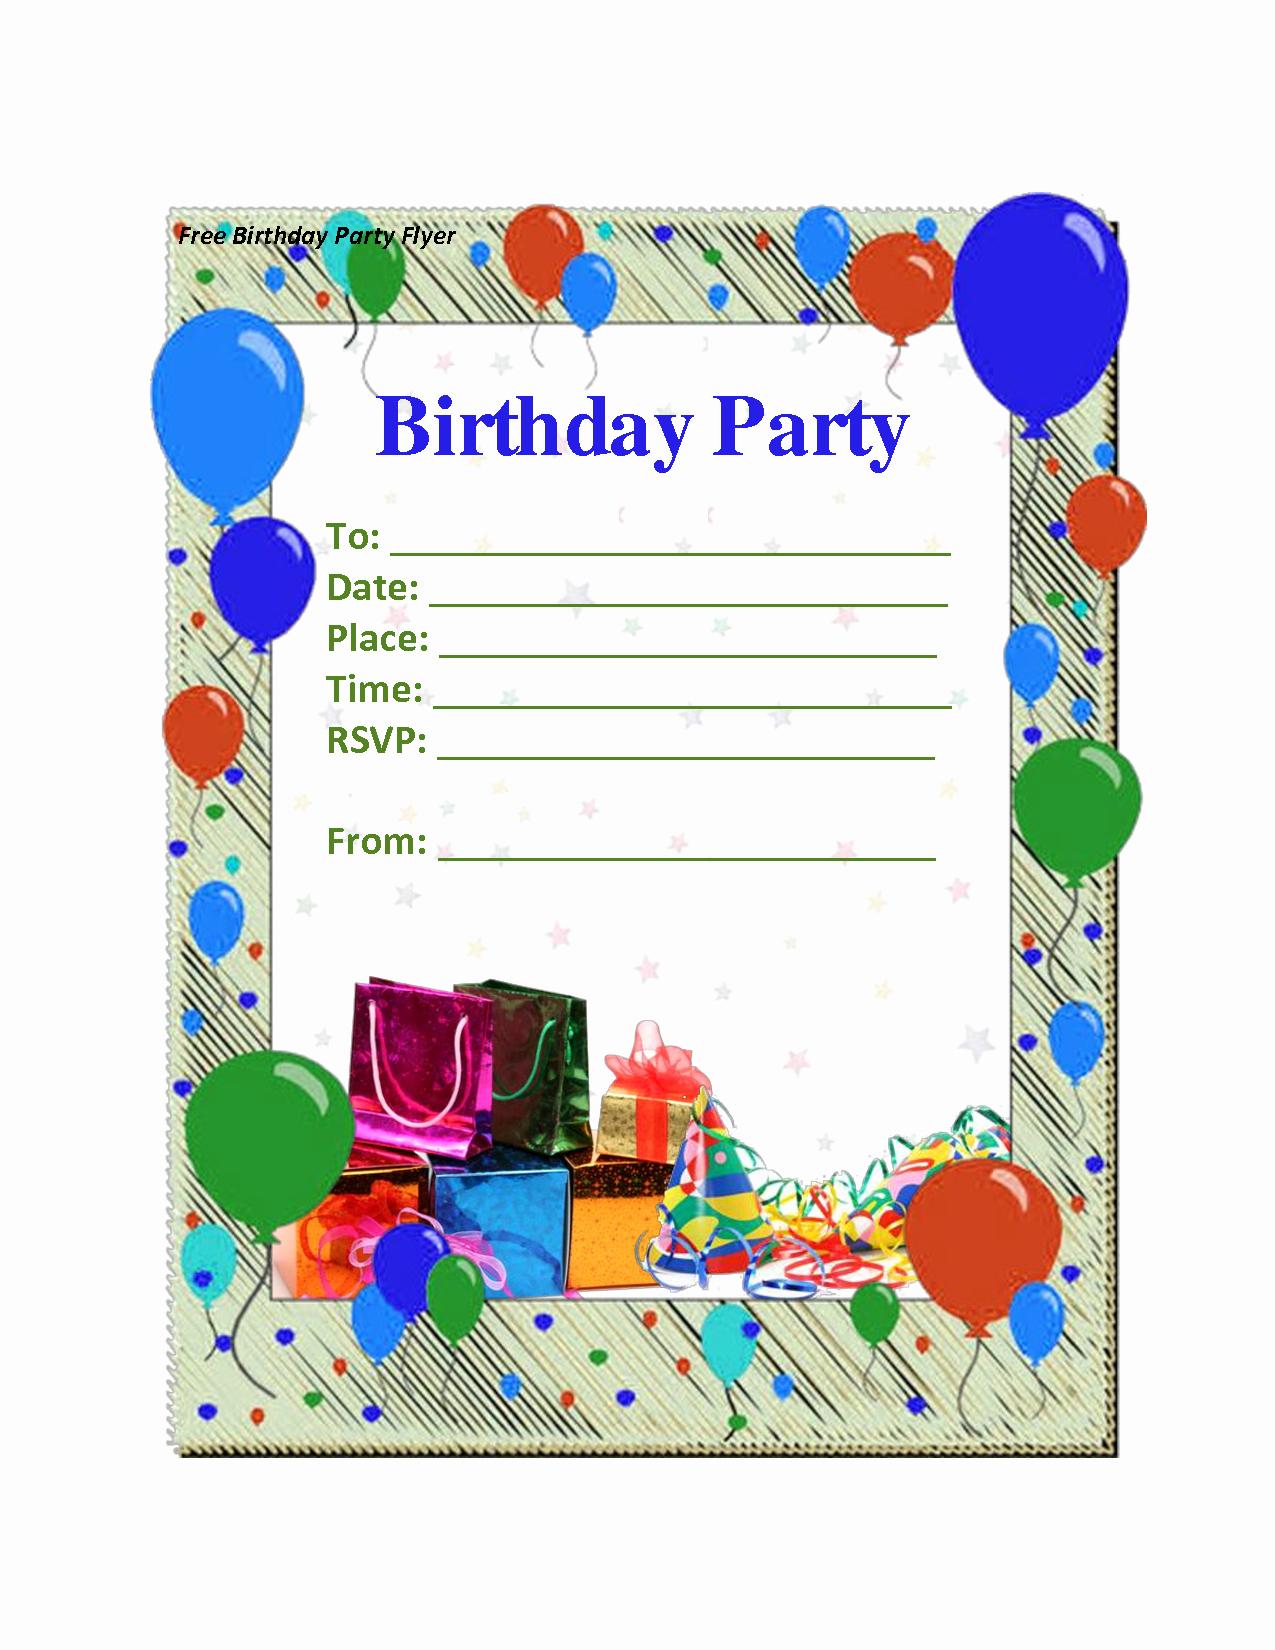 Microsoft Word Party Invitation Templates Unique Microsoft Fice Invitation Templates Free Download